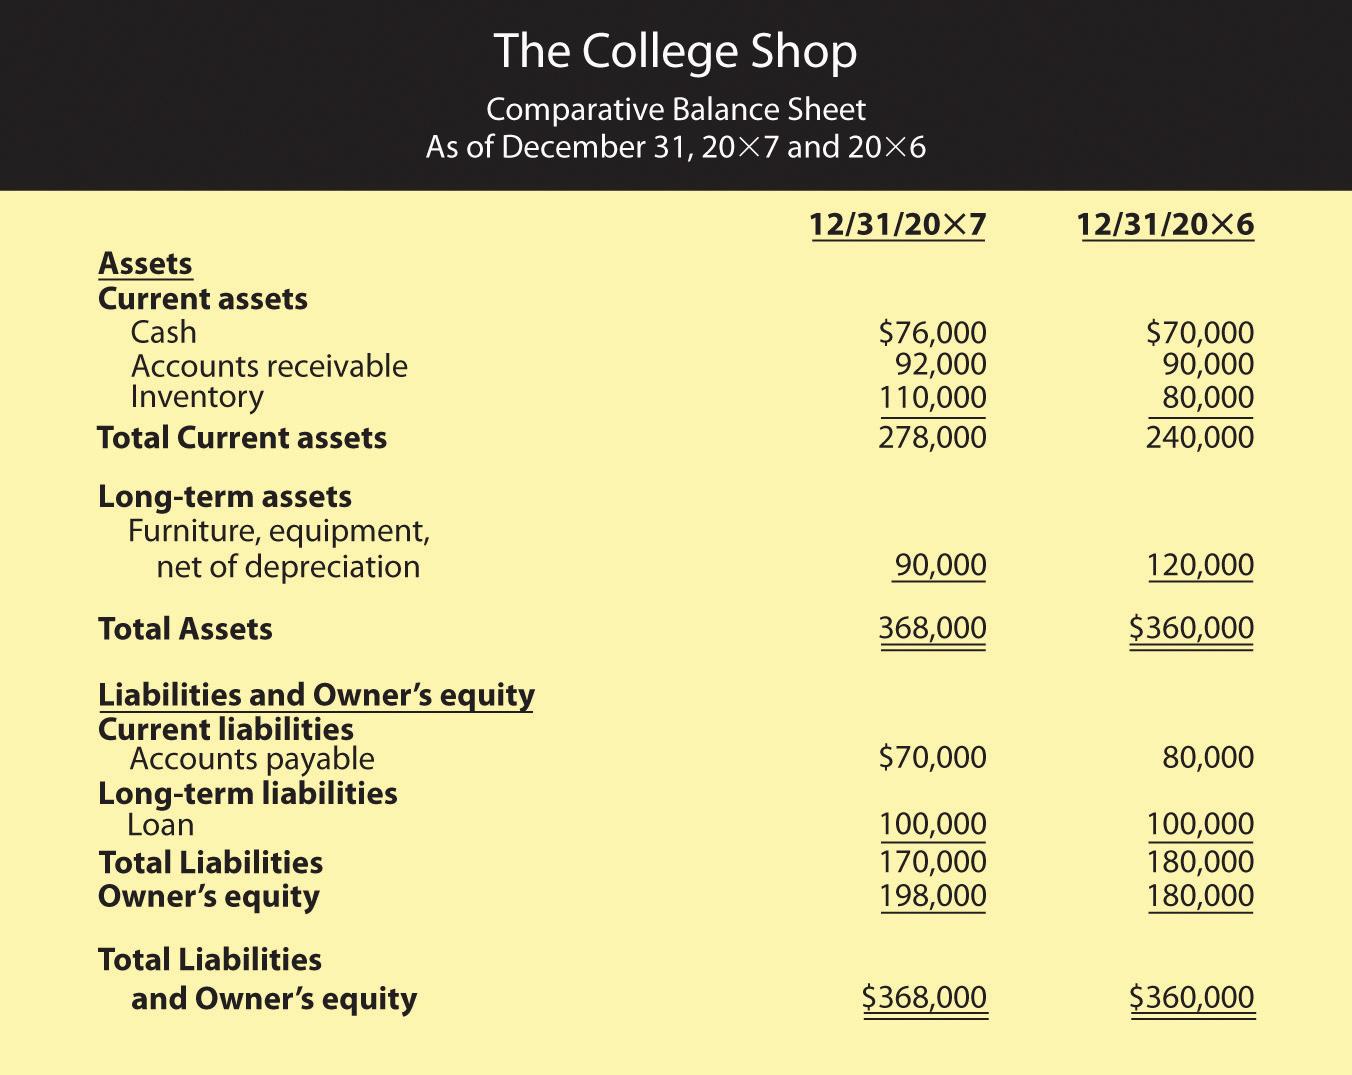 Financial Statementysis